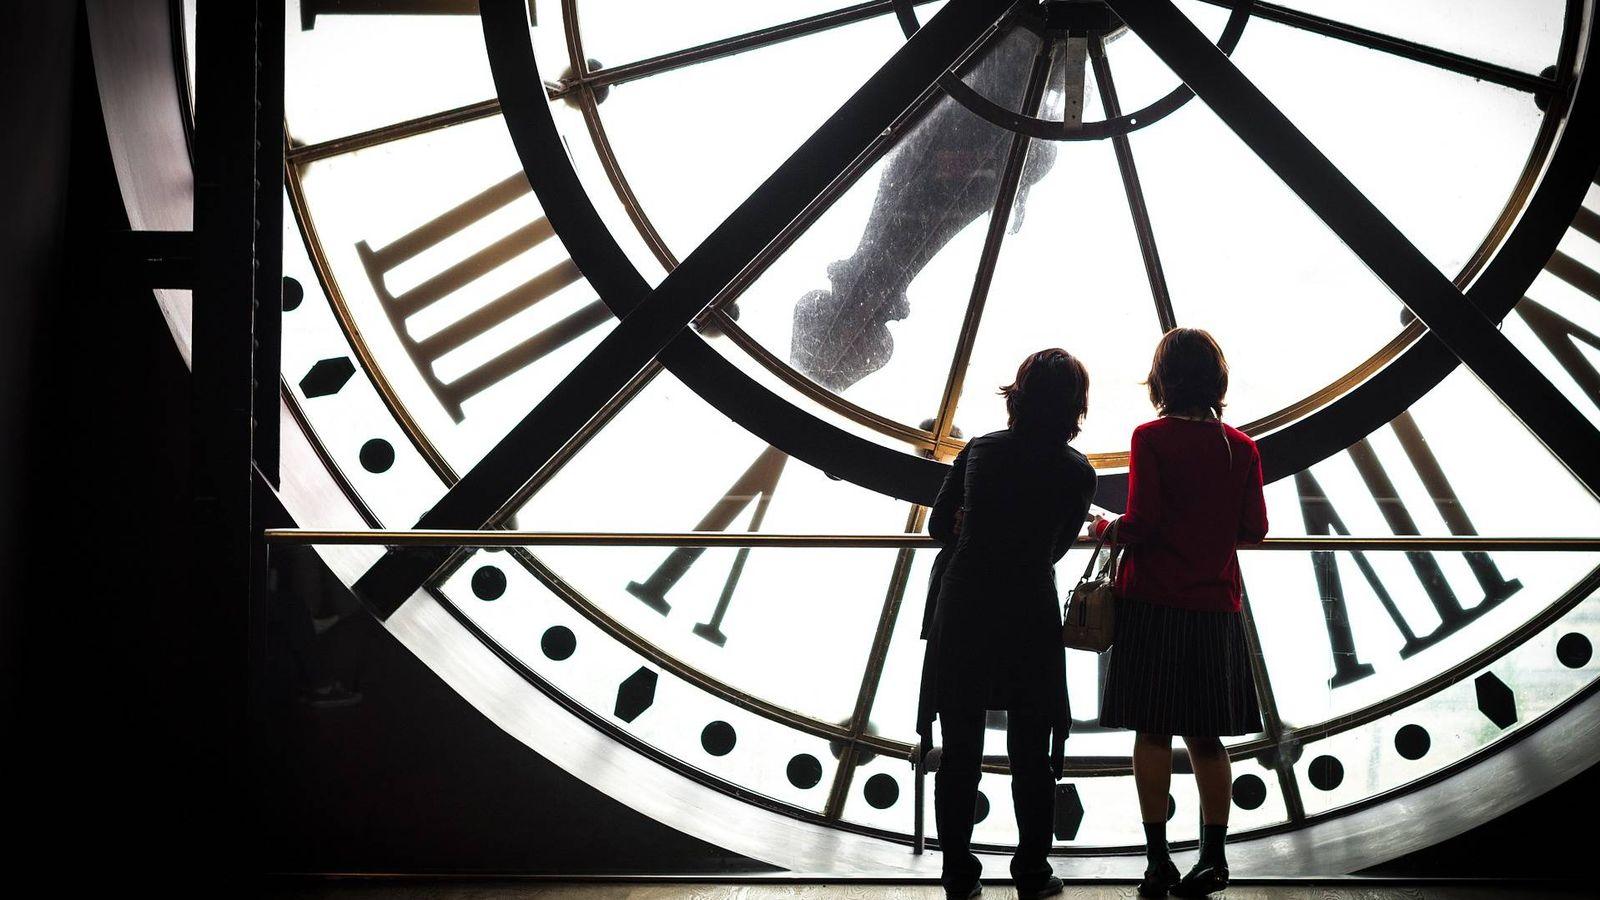 Foto: Dos turistas contemplan un gran reloj por dentro. (Pixabay)